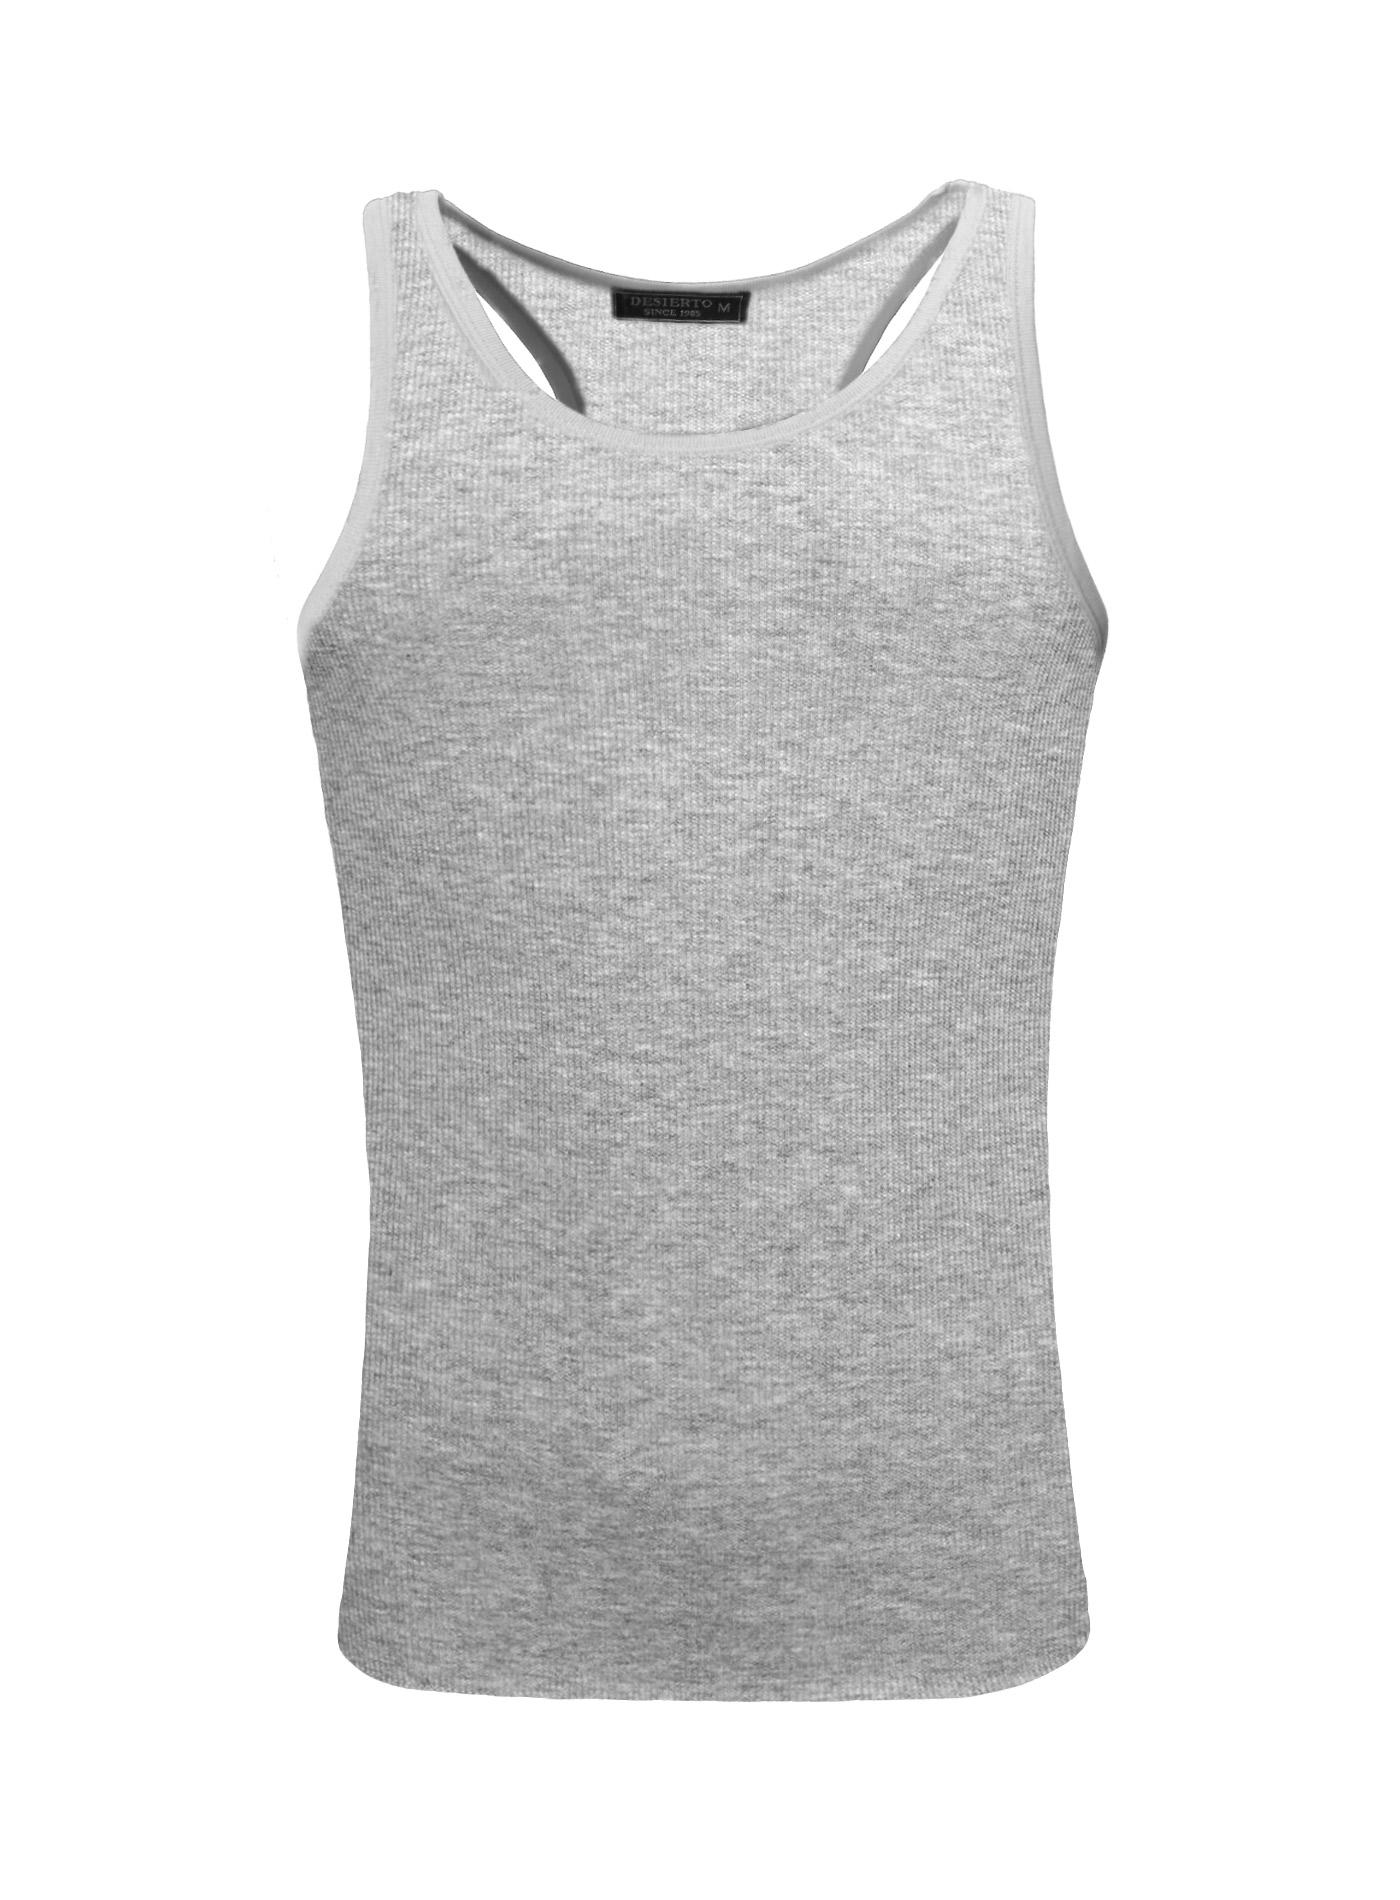 13daffeb Black Sleeveless Undershirts